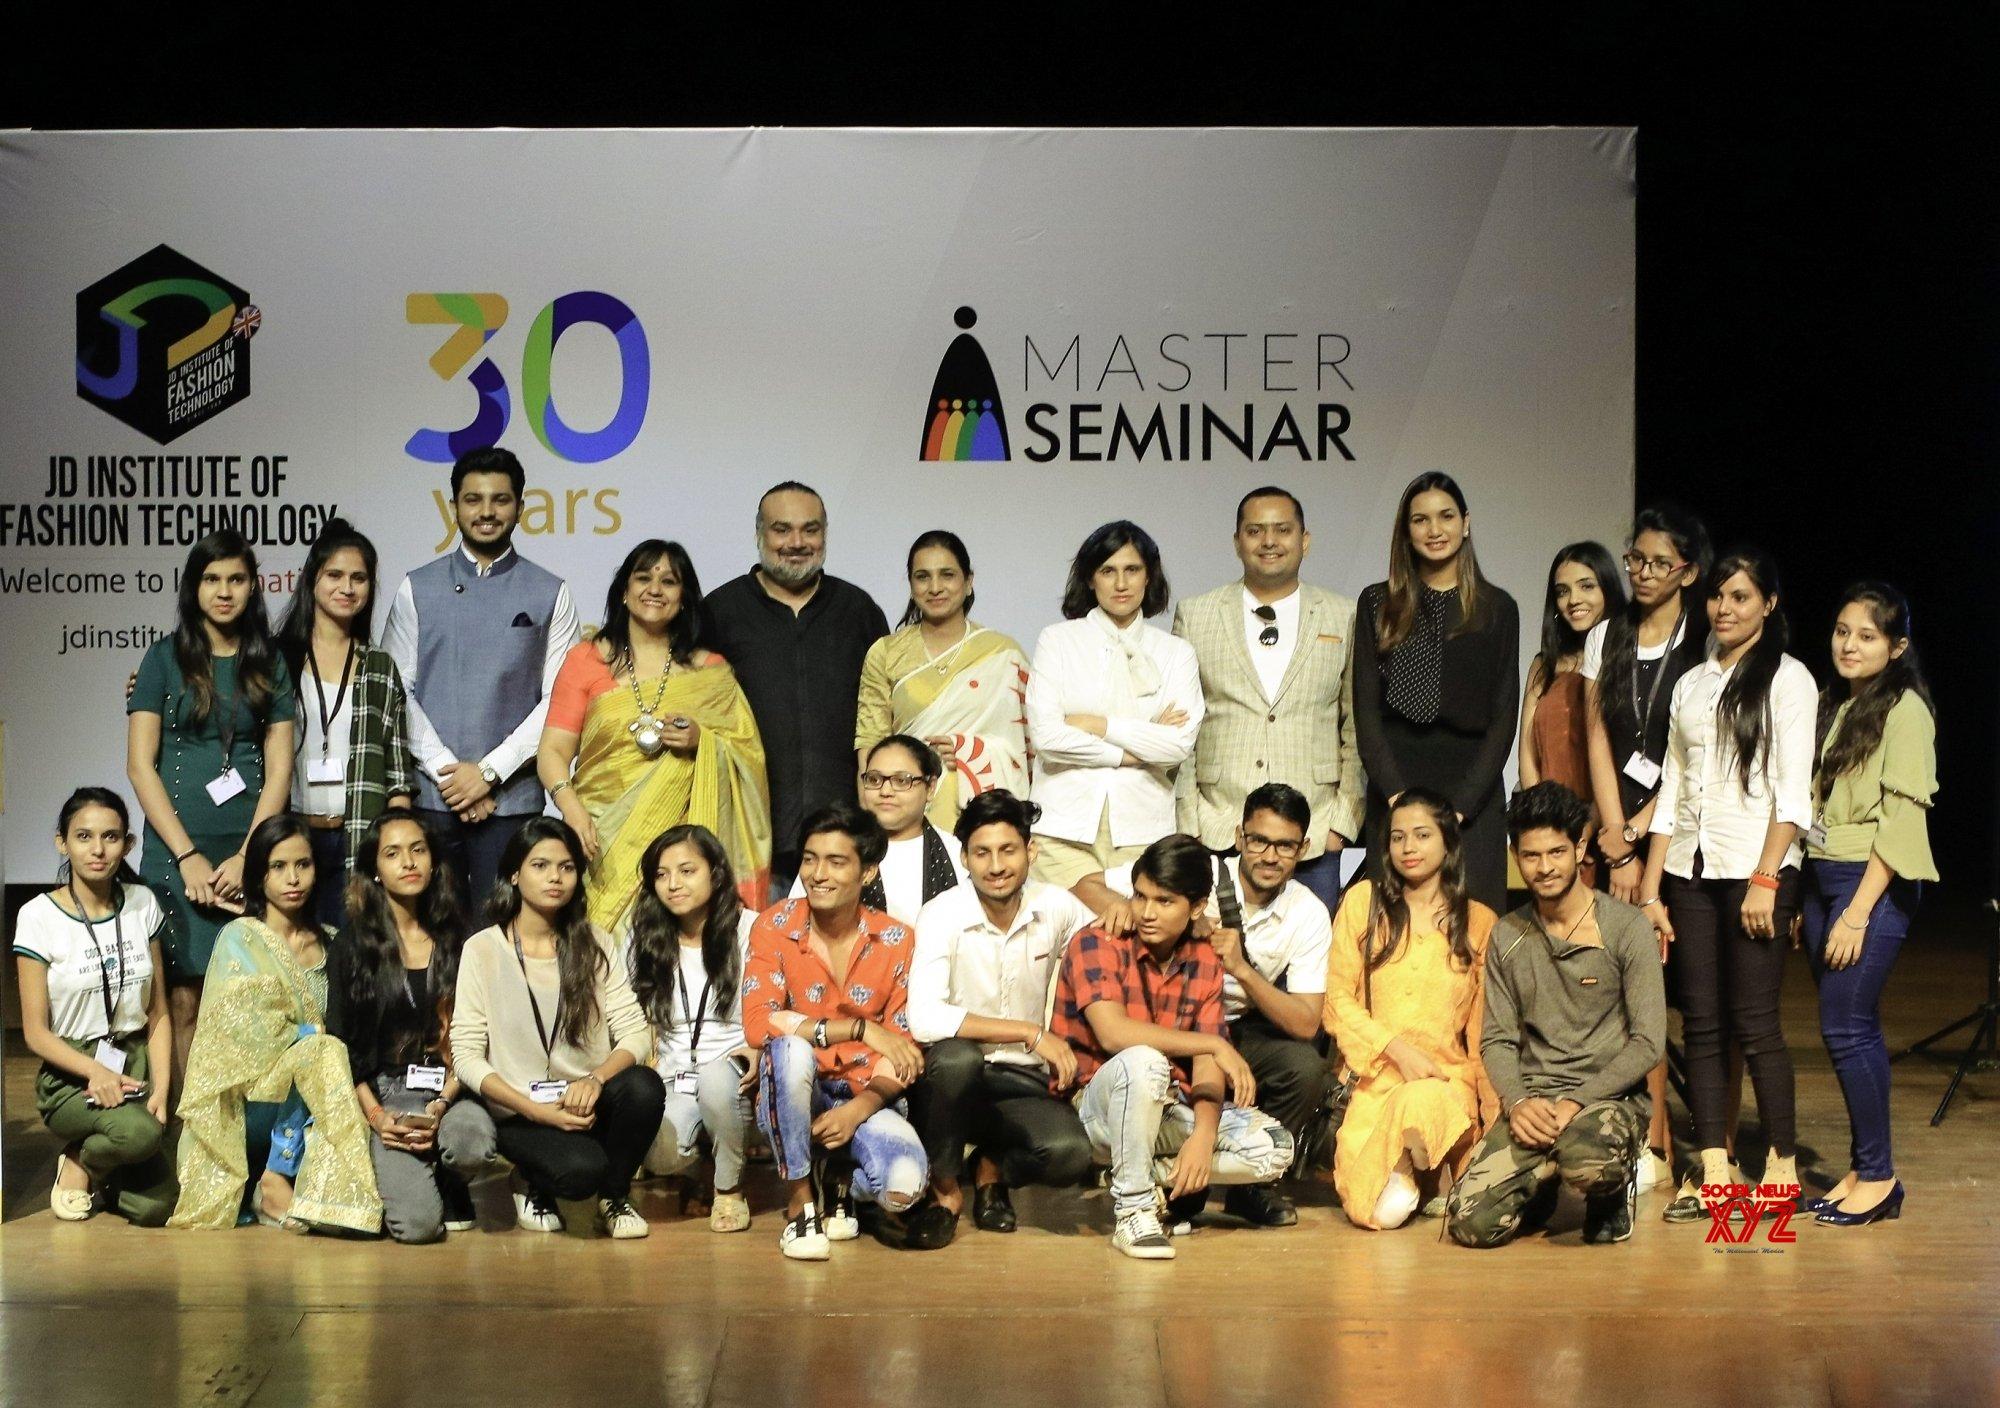 New Delhi Master Seminar At Jd Institute Of Fashion Technology Gallery Social News Xyz